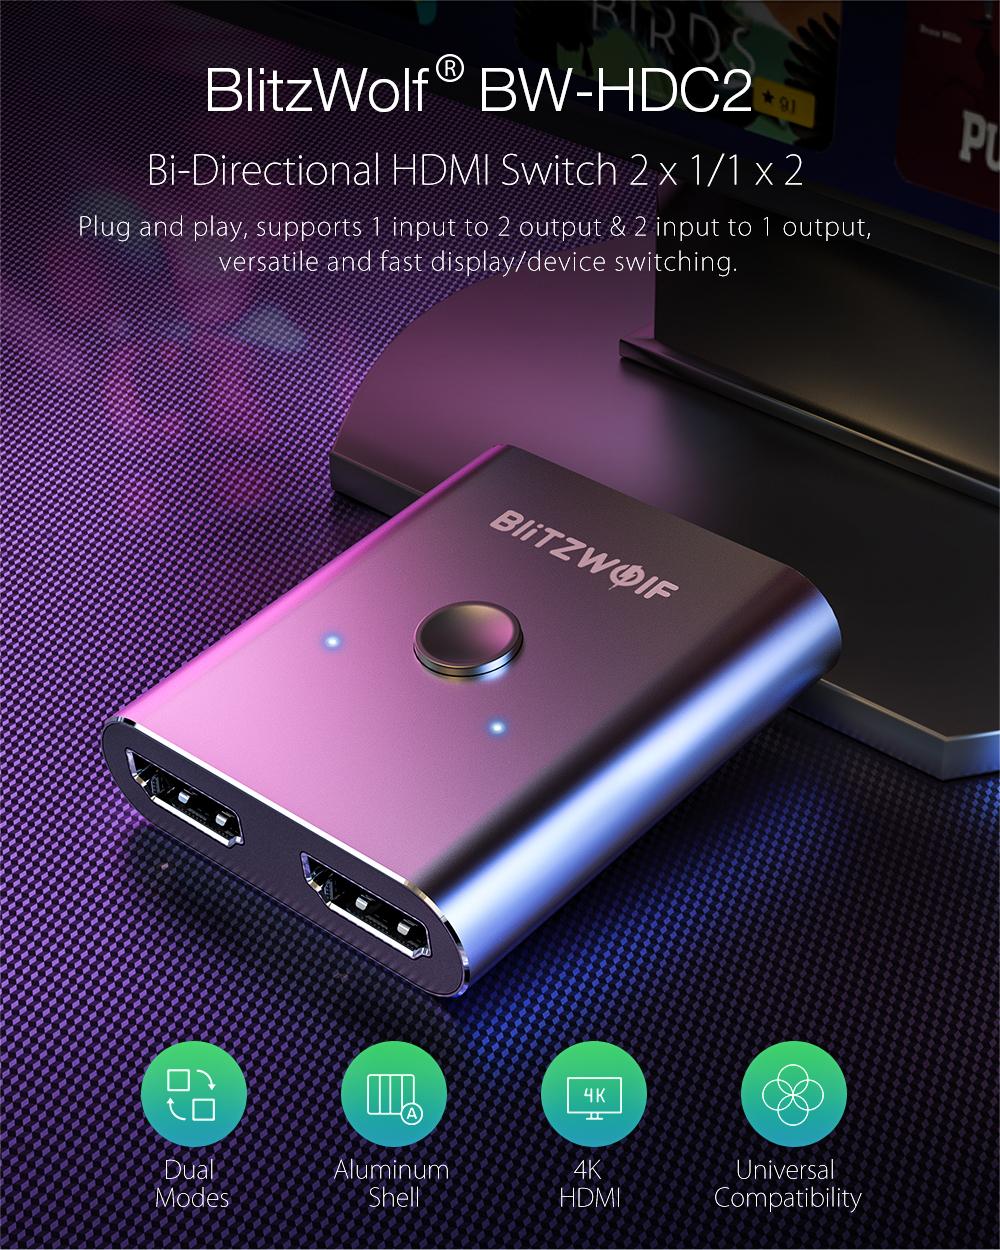 HDMI Switch - Blitzwolf BW-HDC2